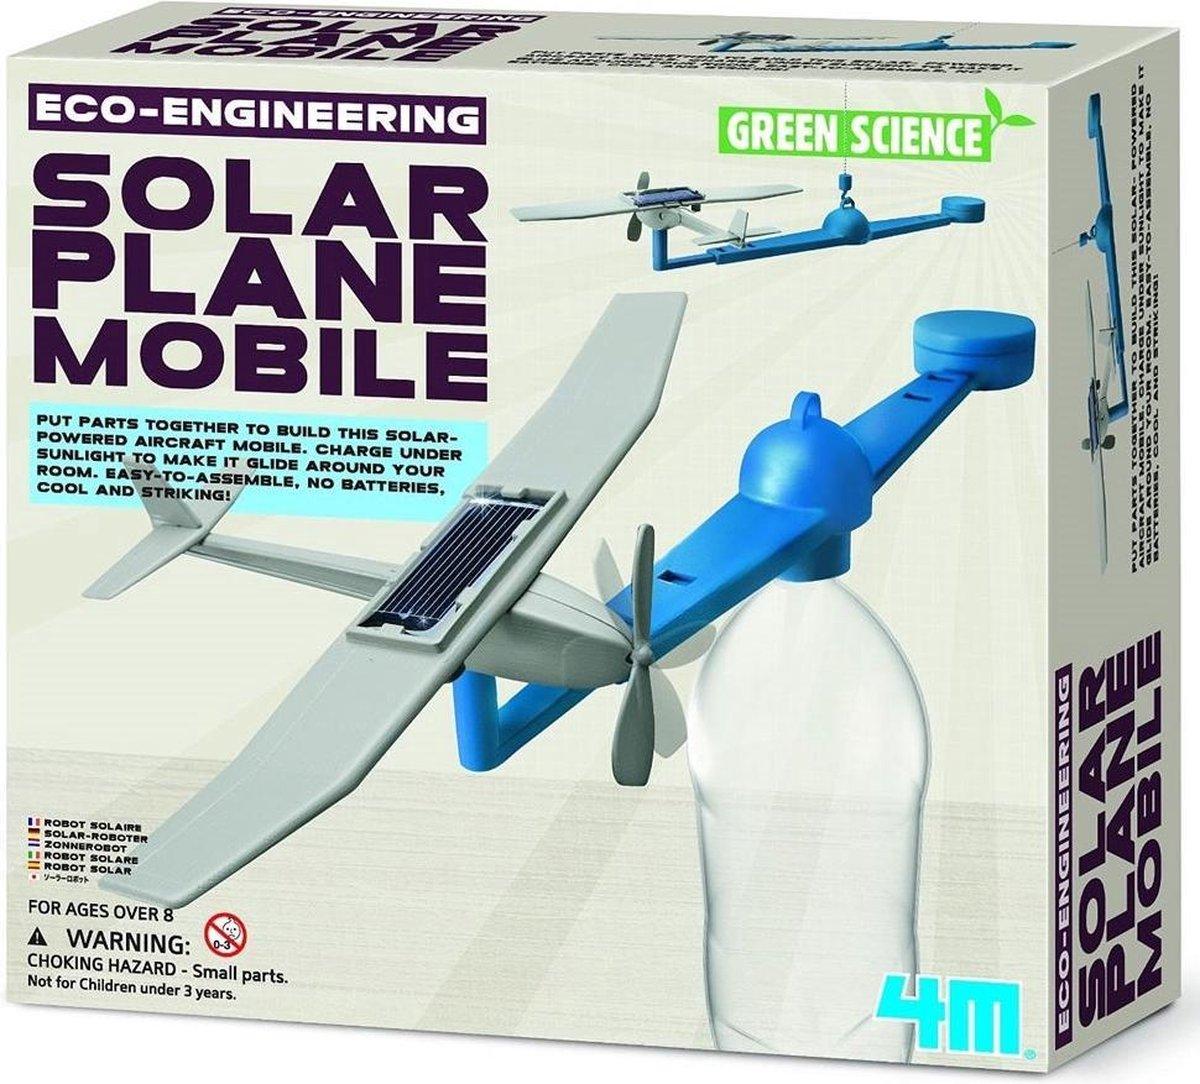 4m Kidzlabs Green Science/eco-engineering: Solar Plane Mobile